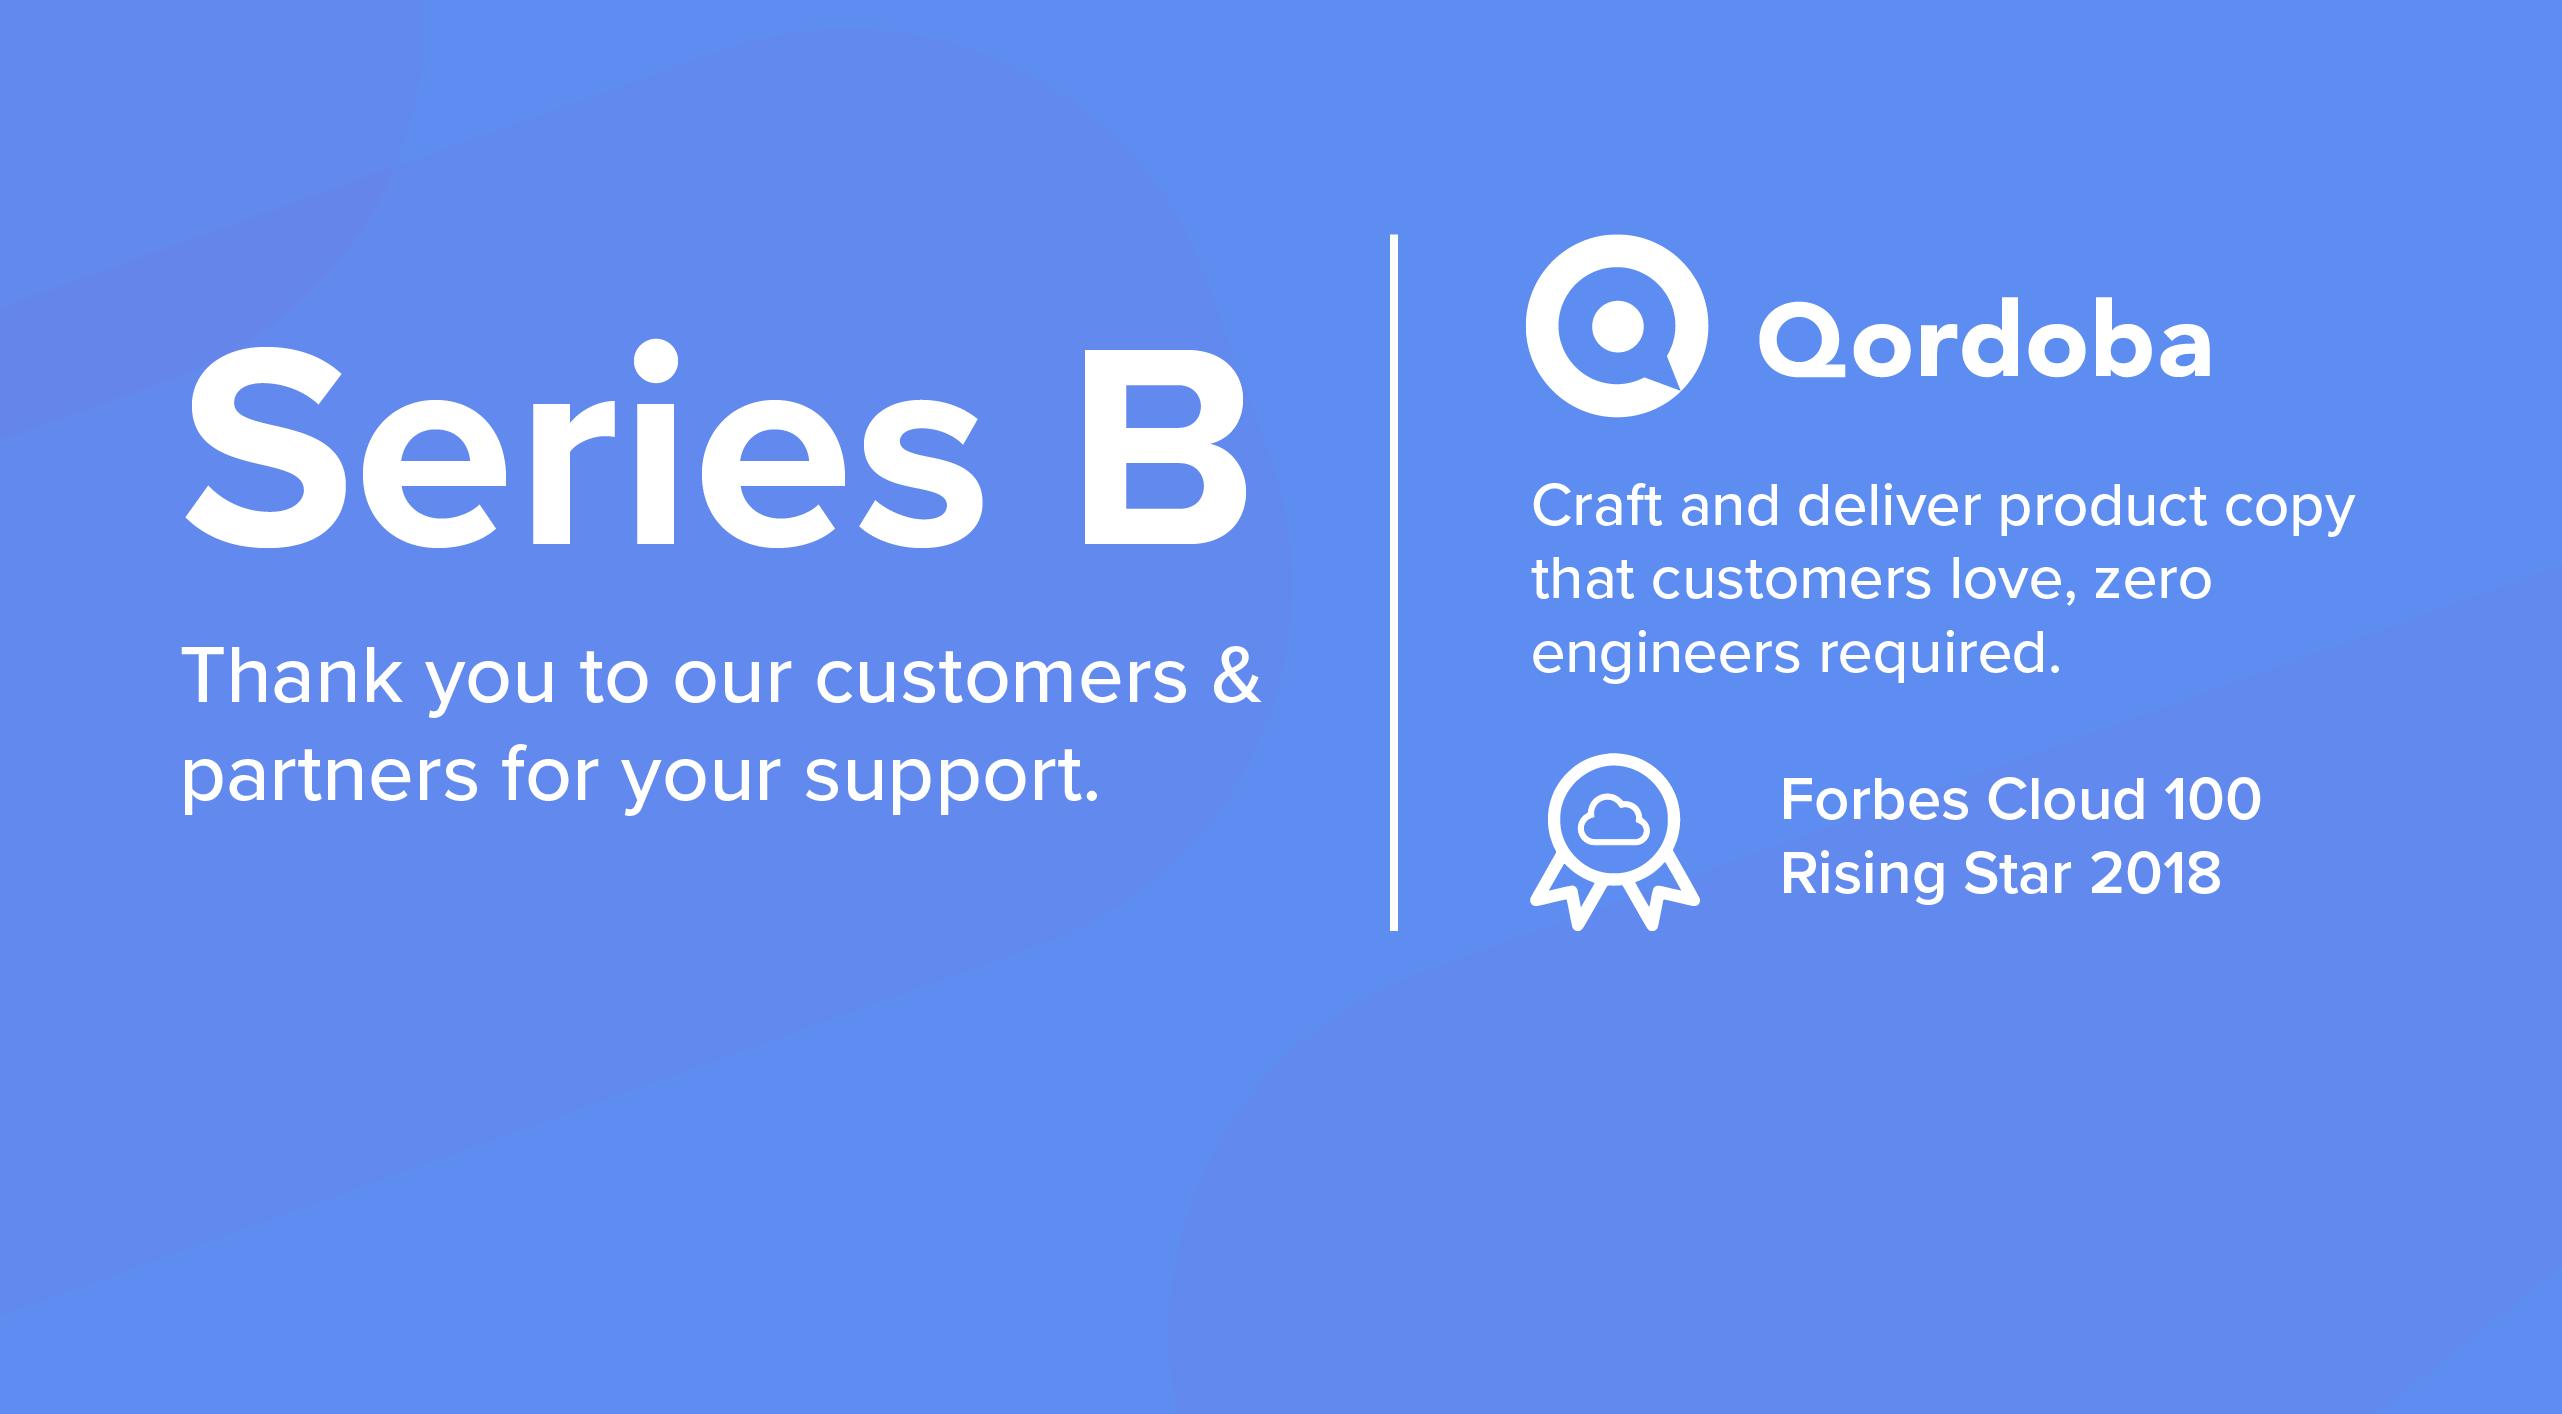 Qordoba Receives Series B Funding Led by Aspect Ventures' Jennifer Fonstad